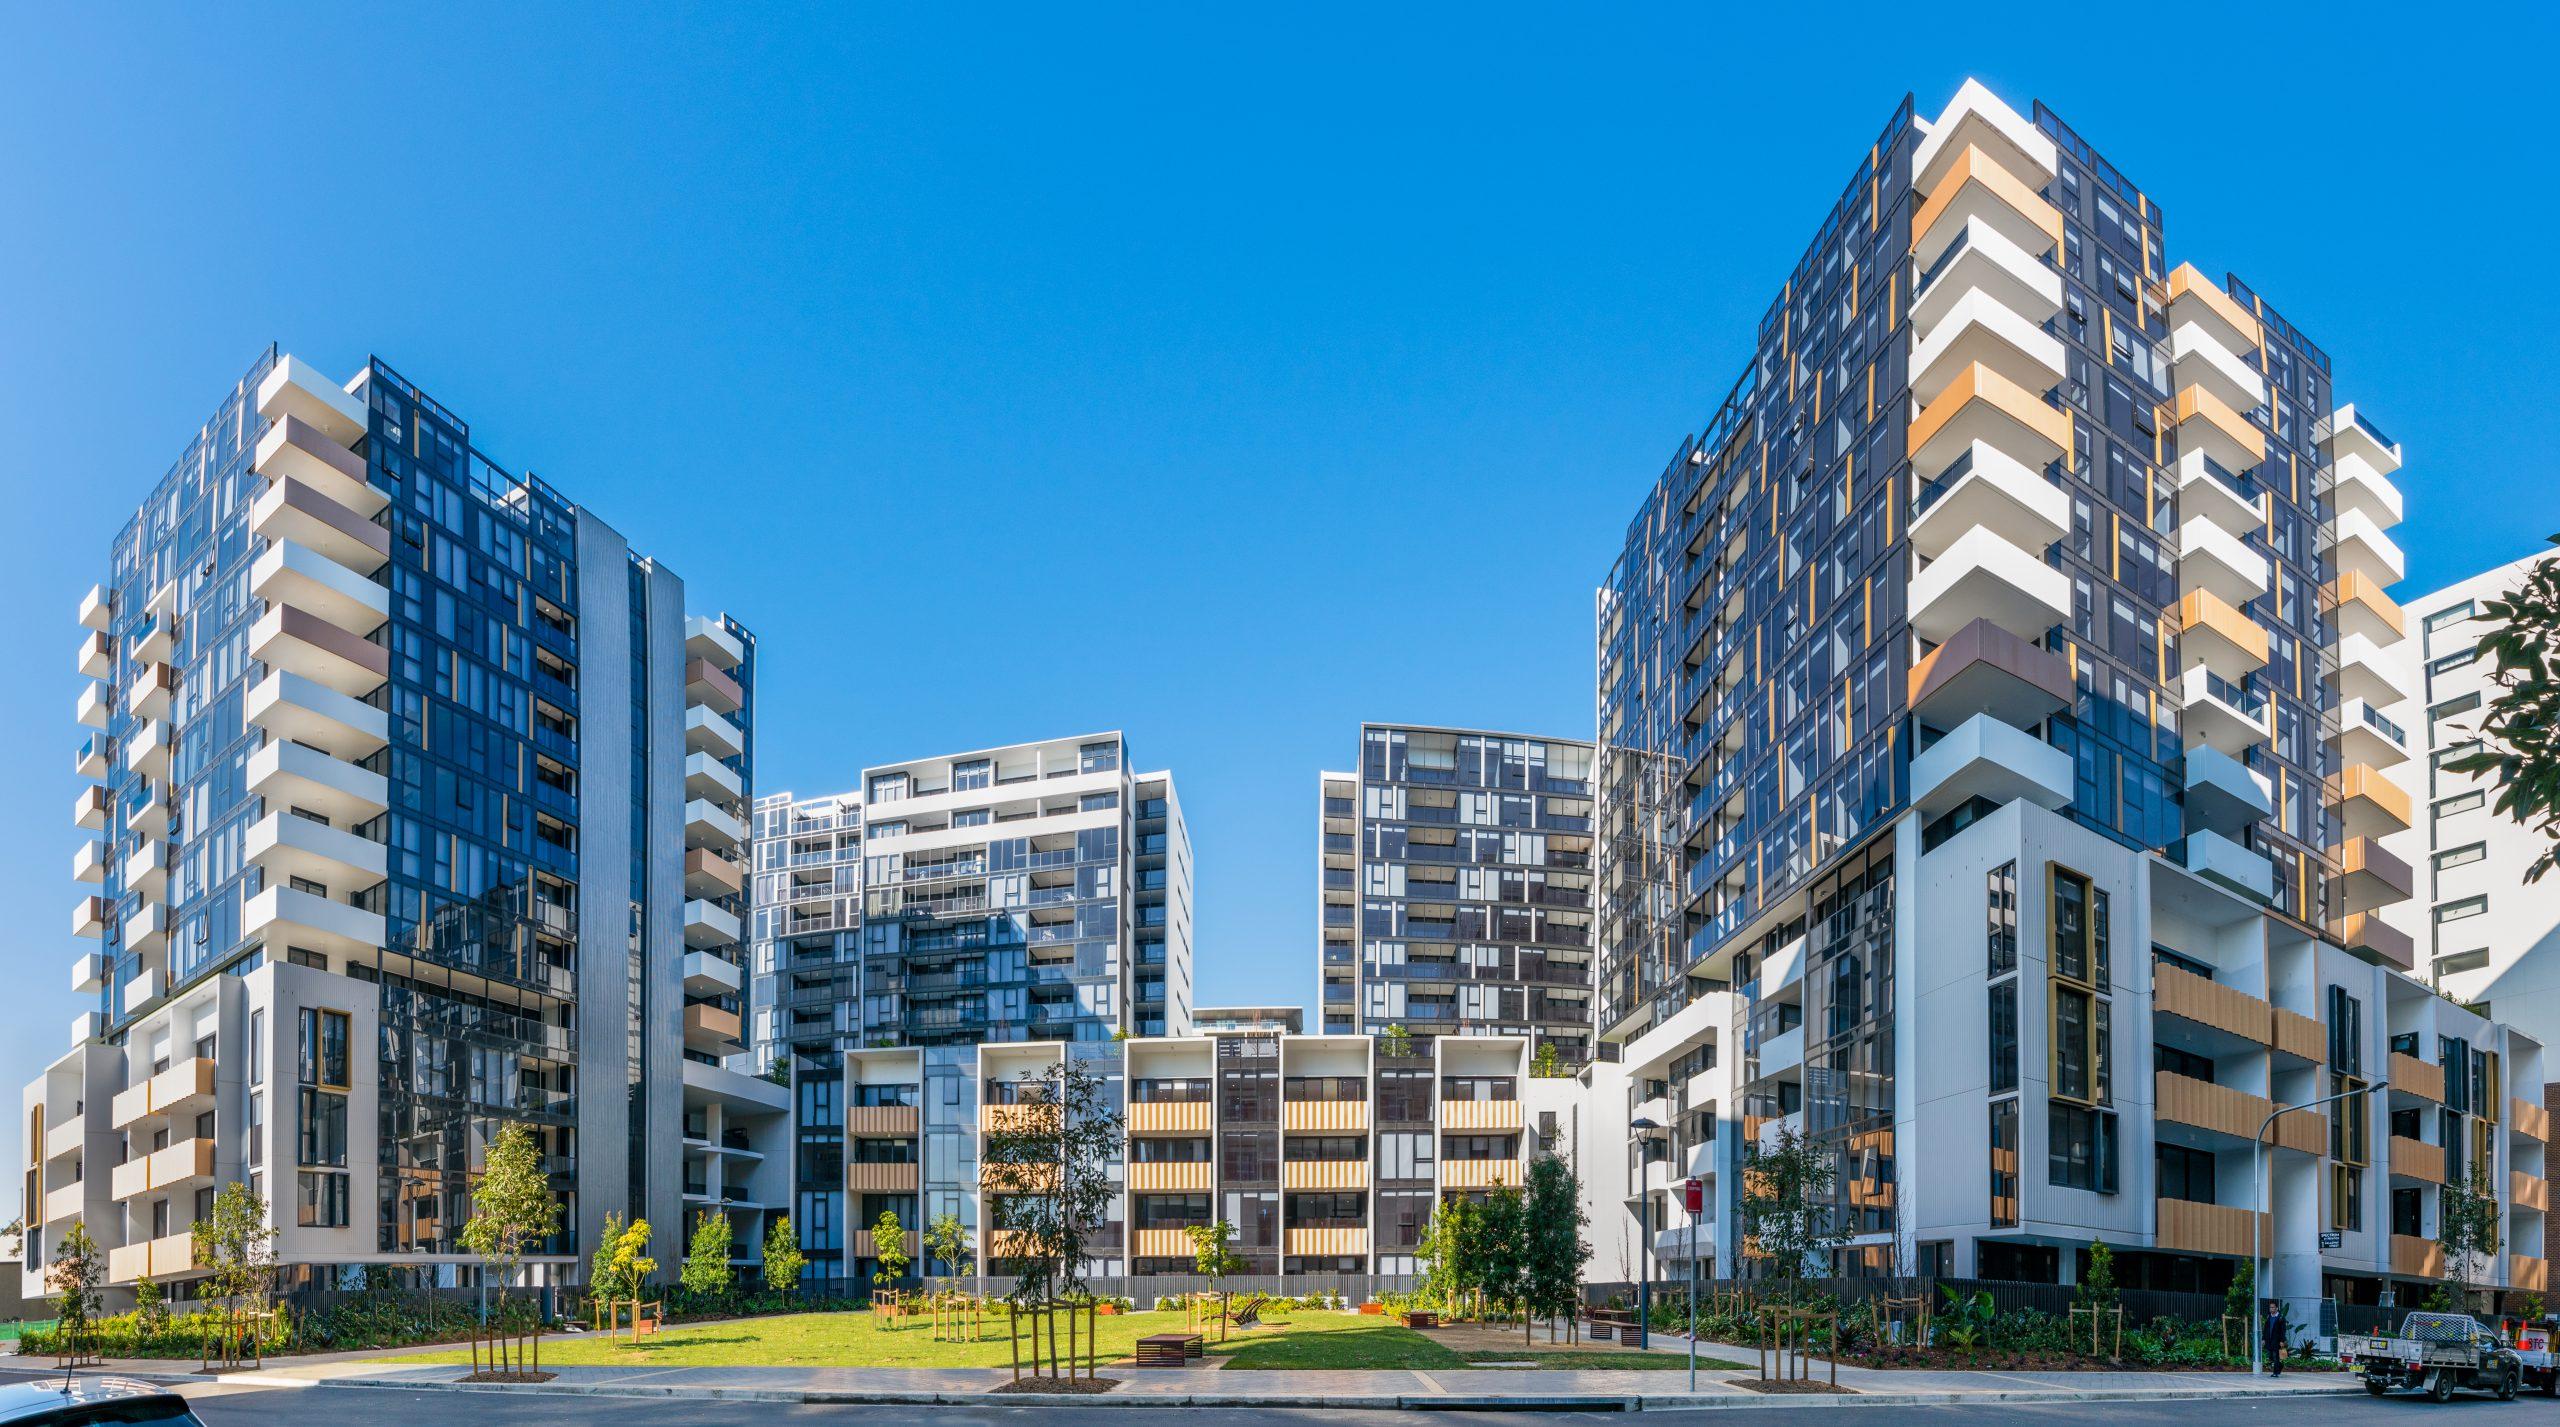 Apartments for Sale Mascot NSW | Spectrum Apartments | Meriton